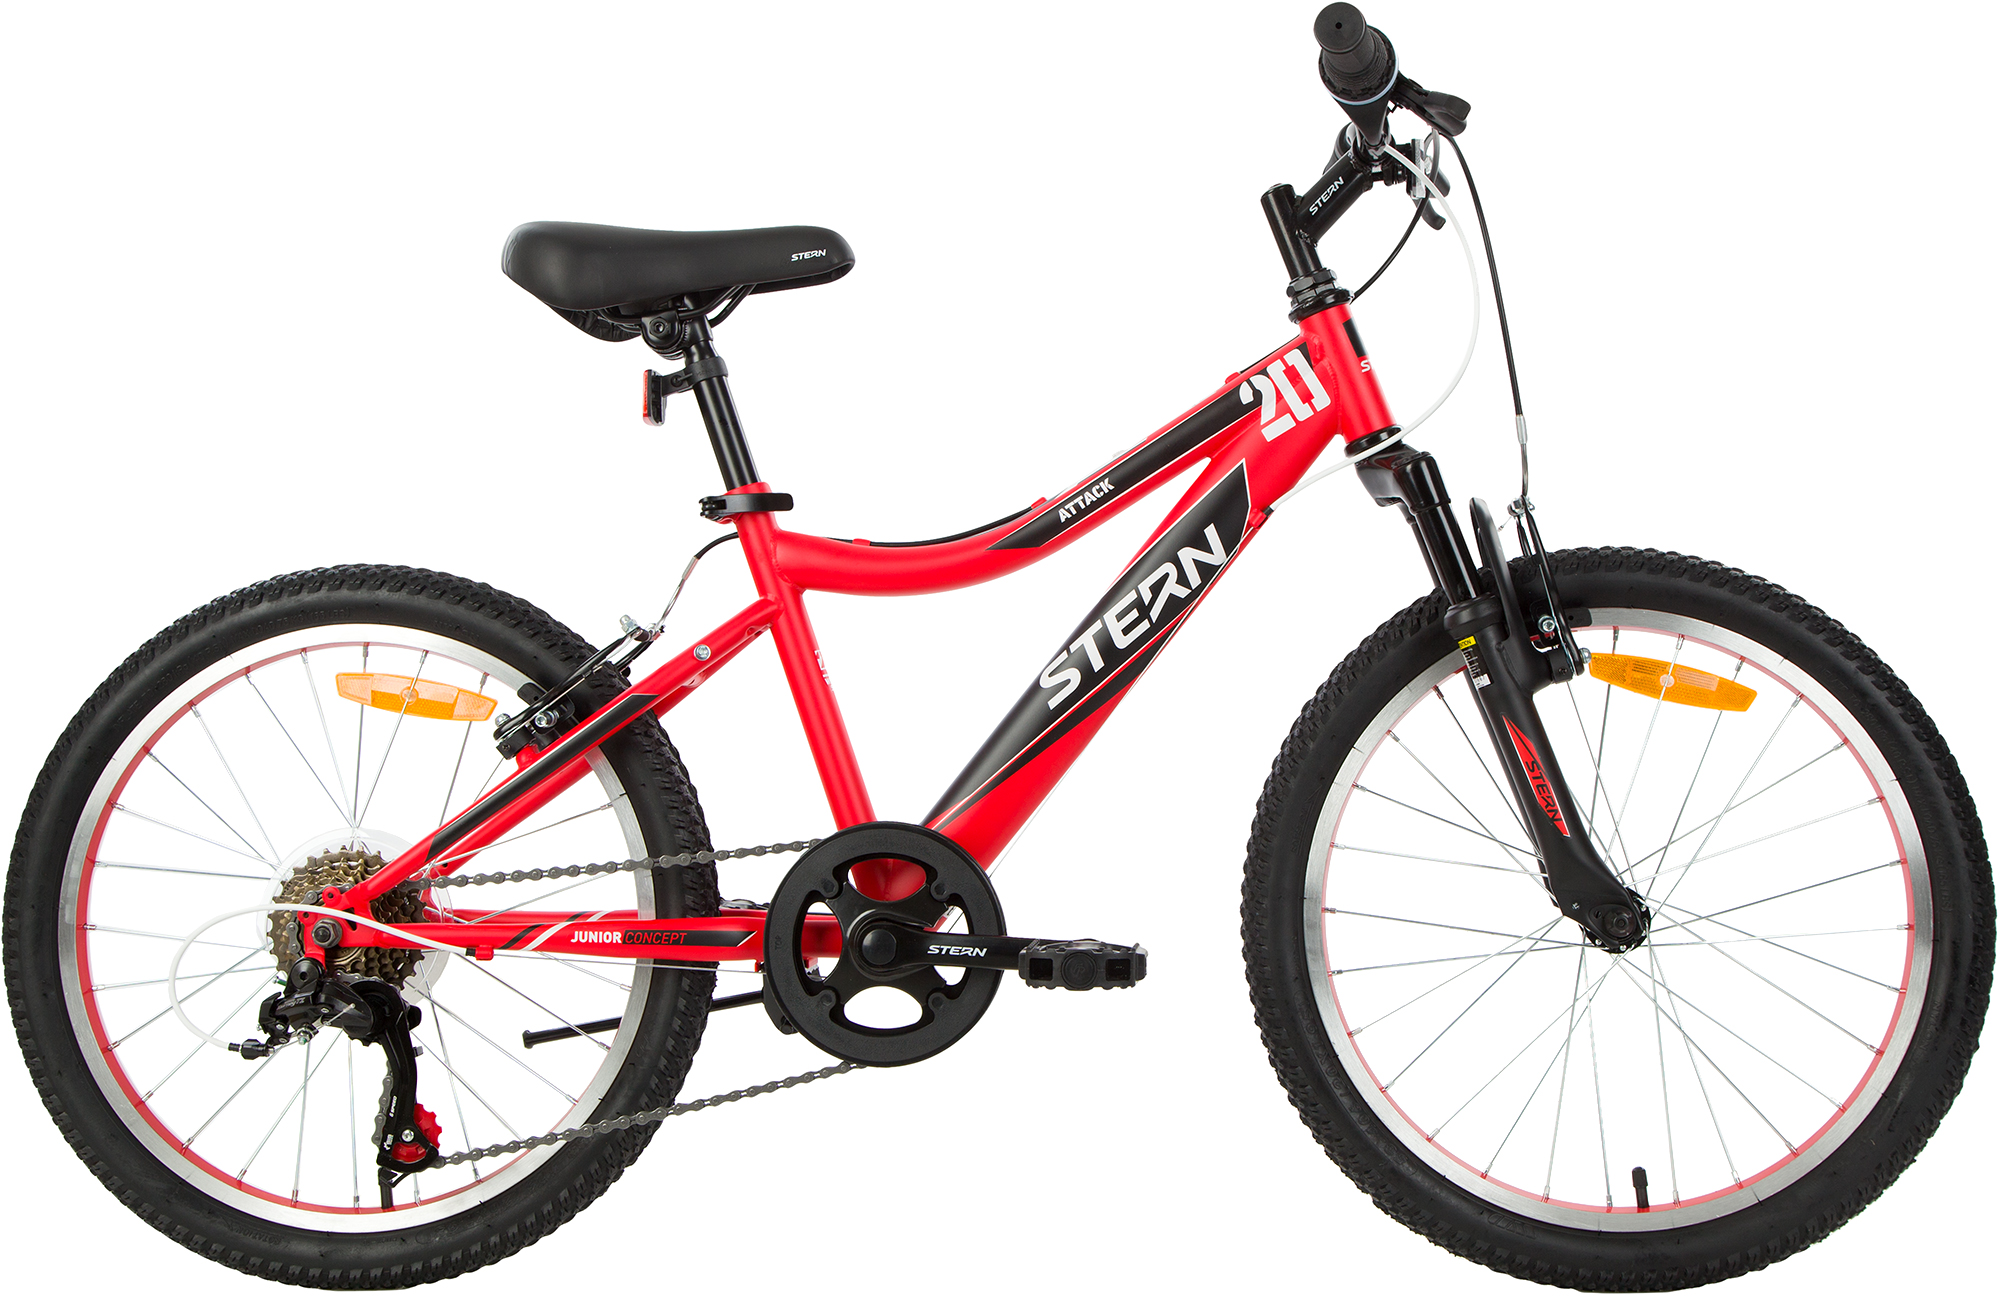 Stern Велосипед подростковый Stern Attack 20 цена